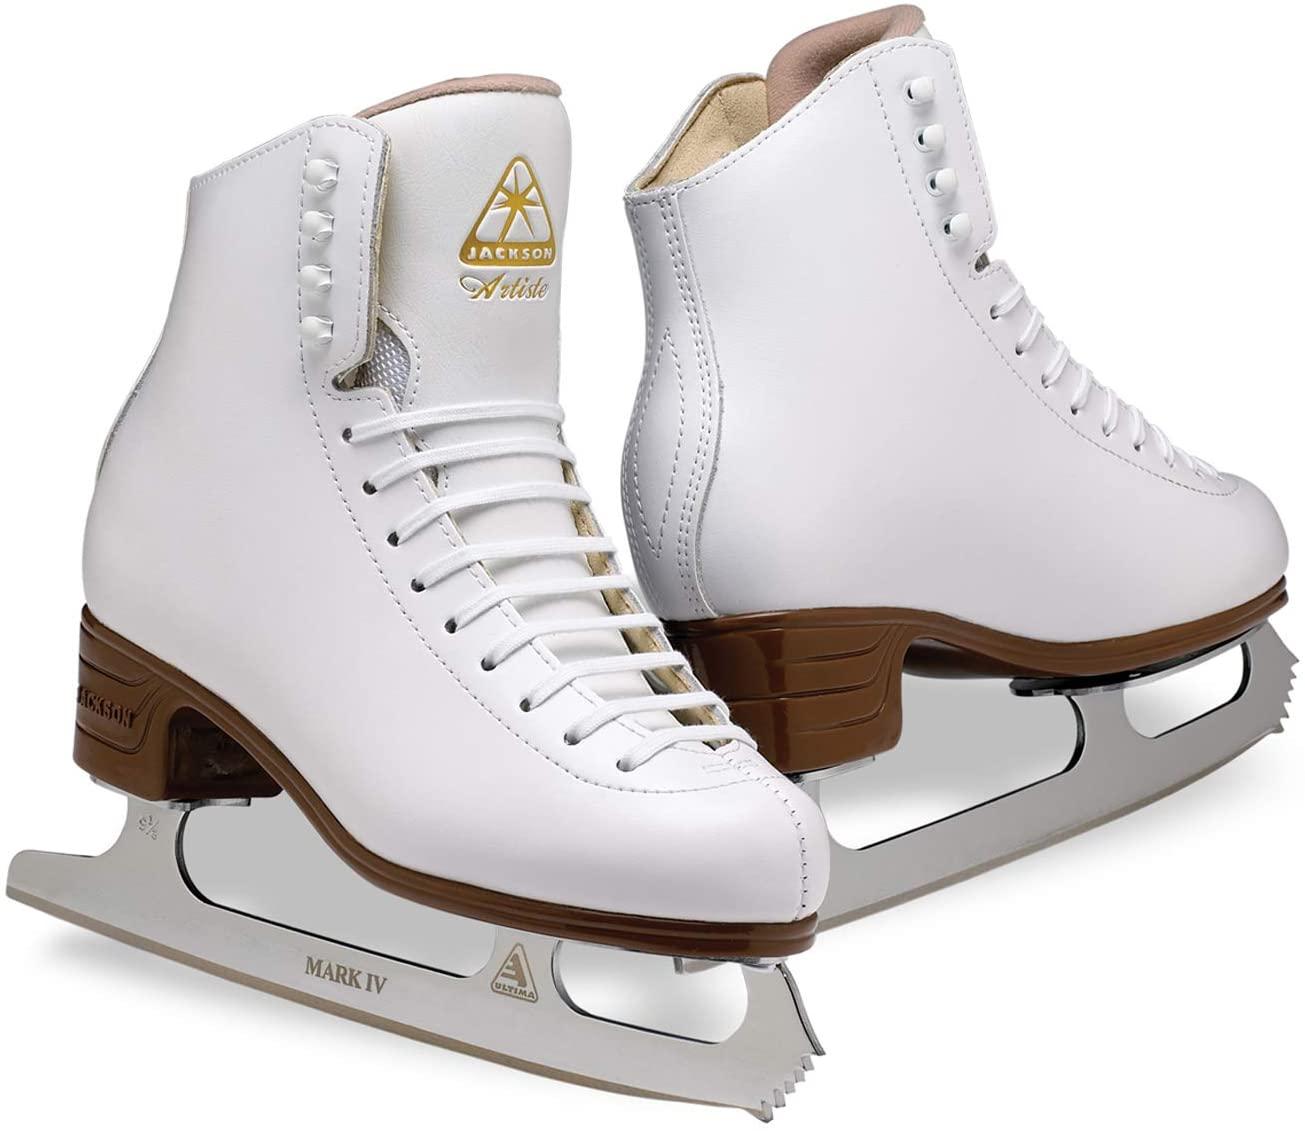 Jackson Ultima Artiste Womens/Girls Figure Ice Skates - Width: C/Size: Adult 9